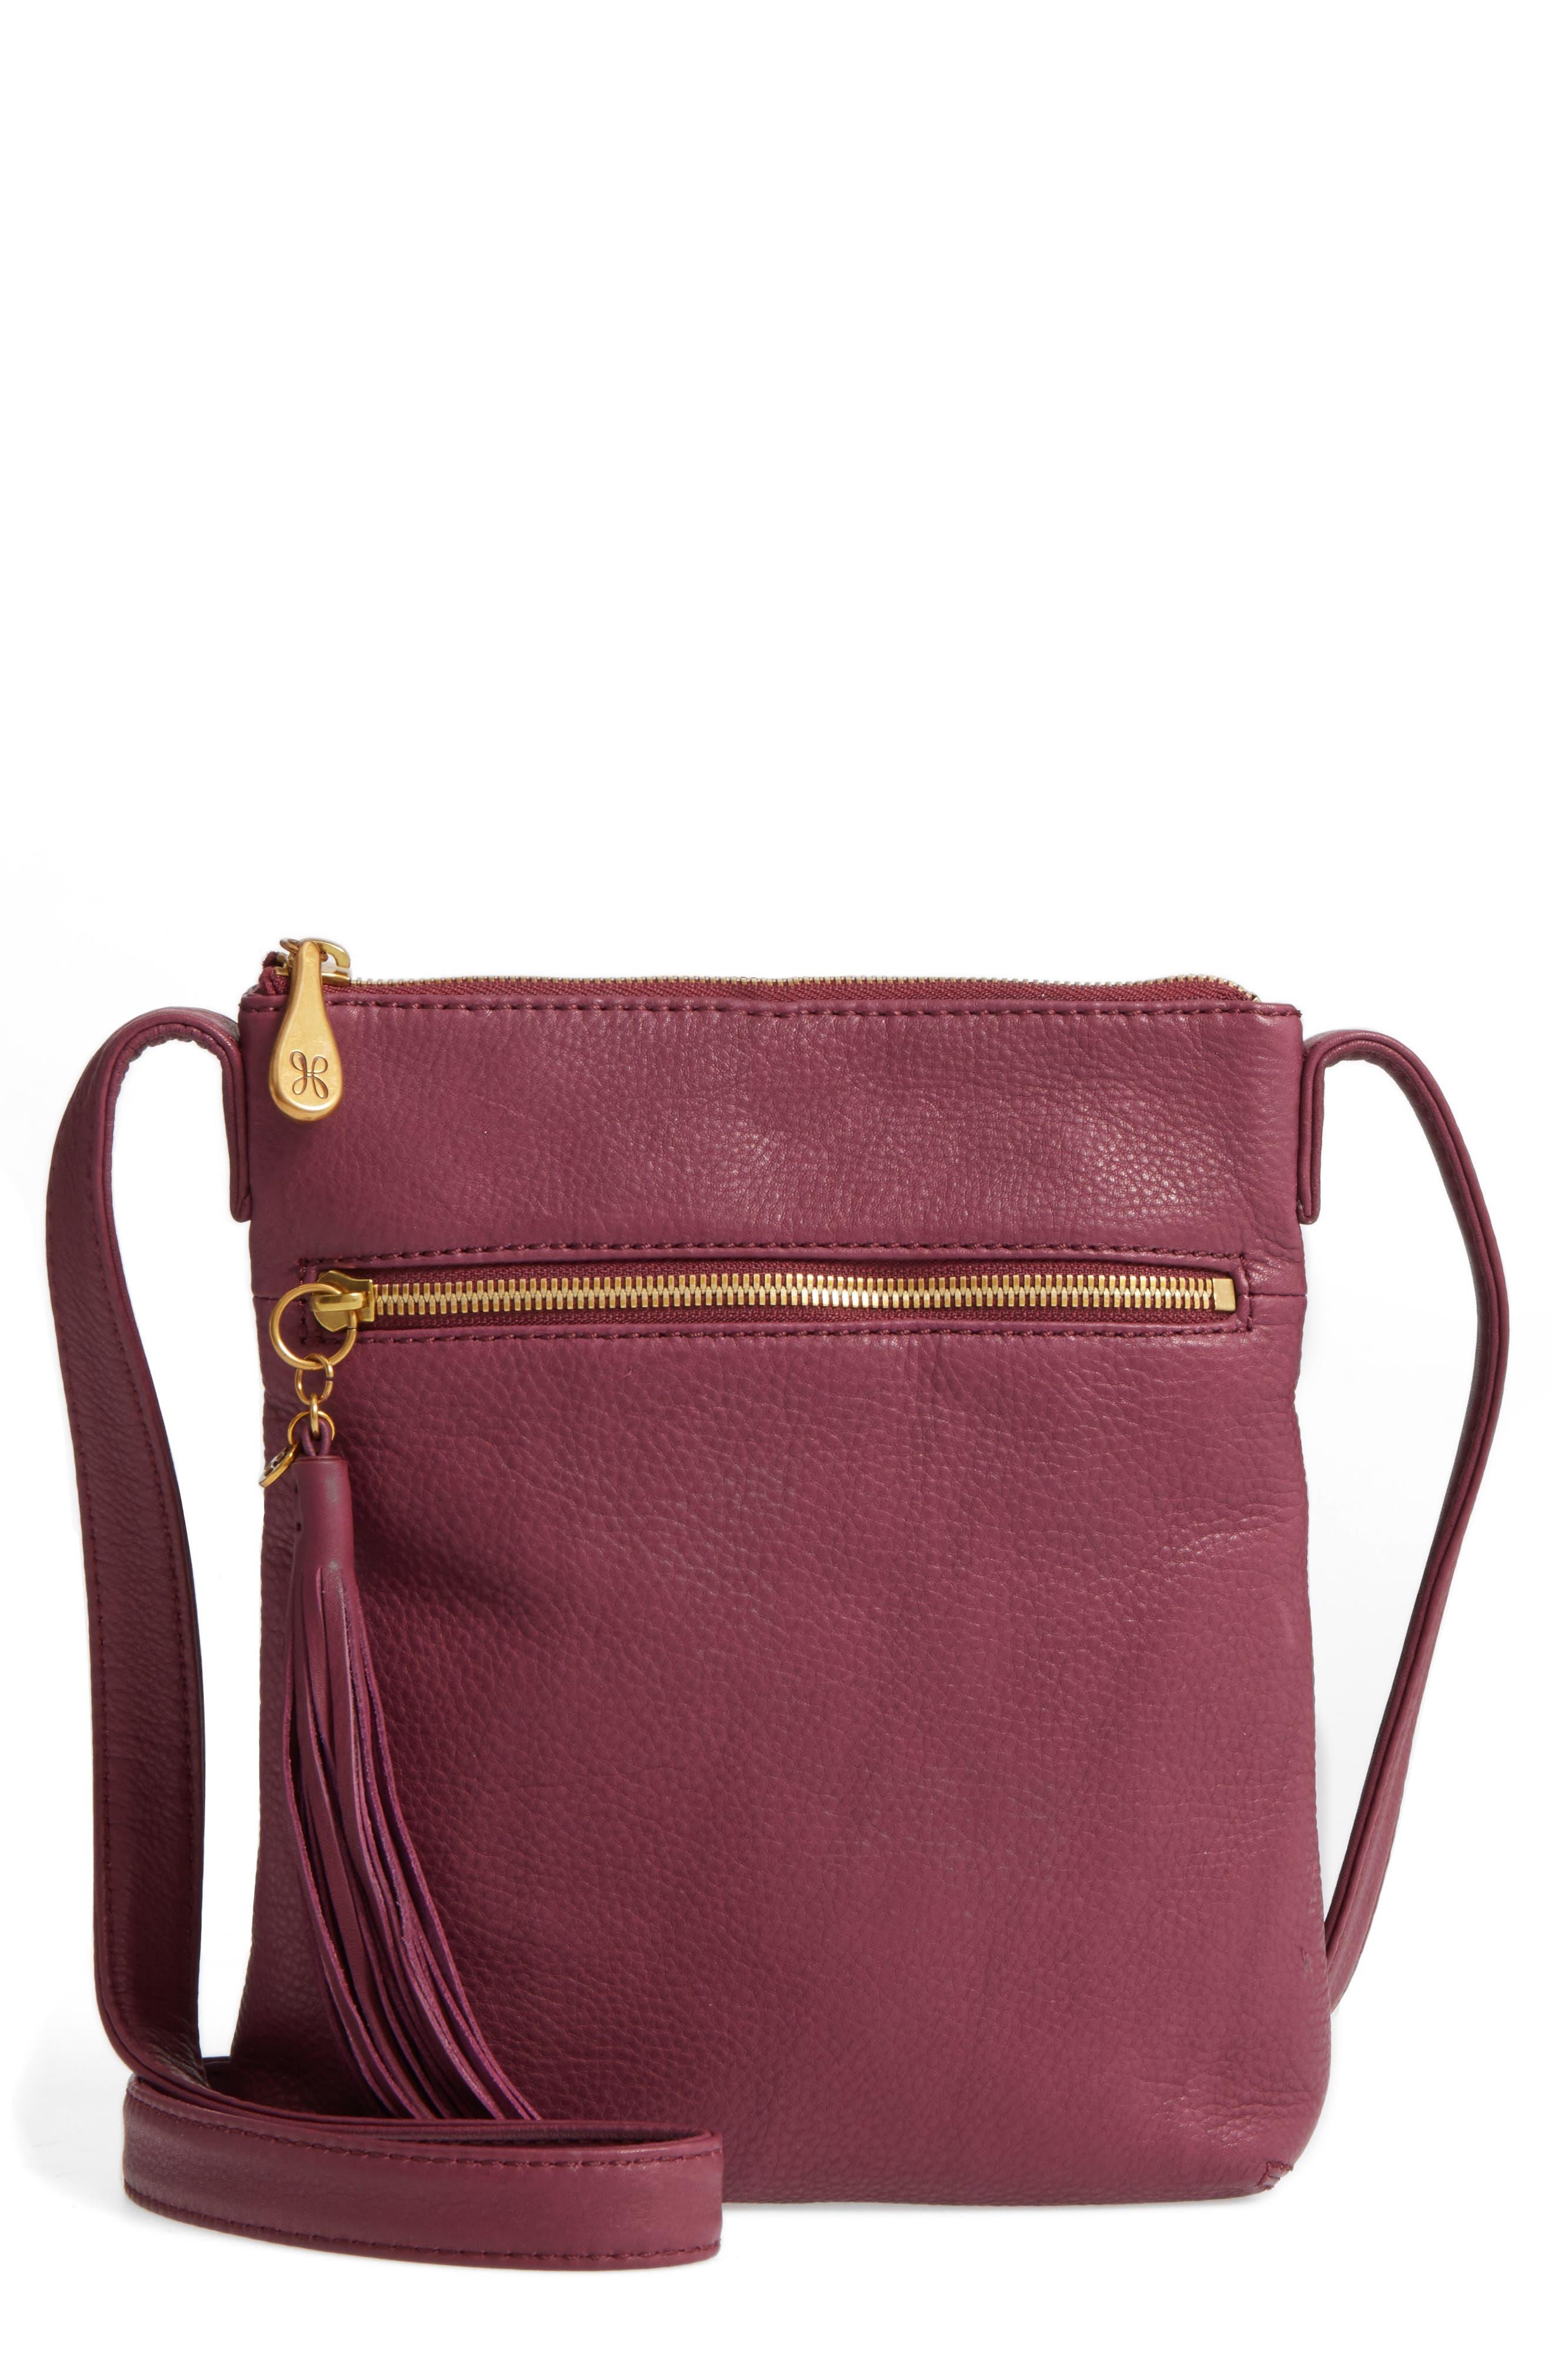 Hobo 'Sarah' Leather Crossbody Bag